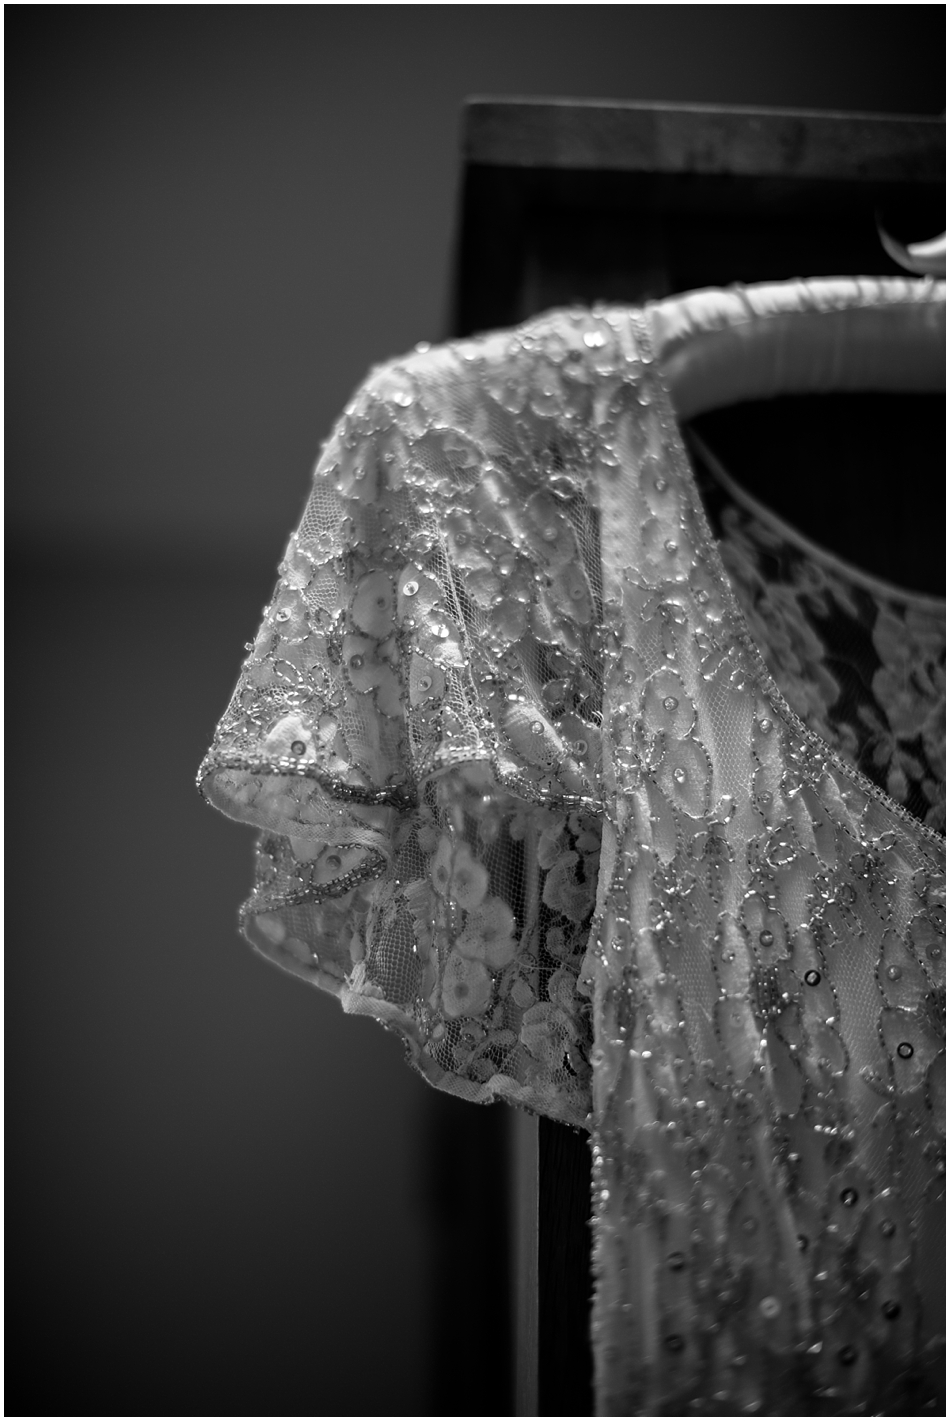 titchwell-manor-wedding-photography_004